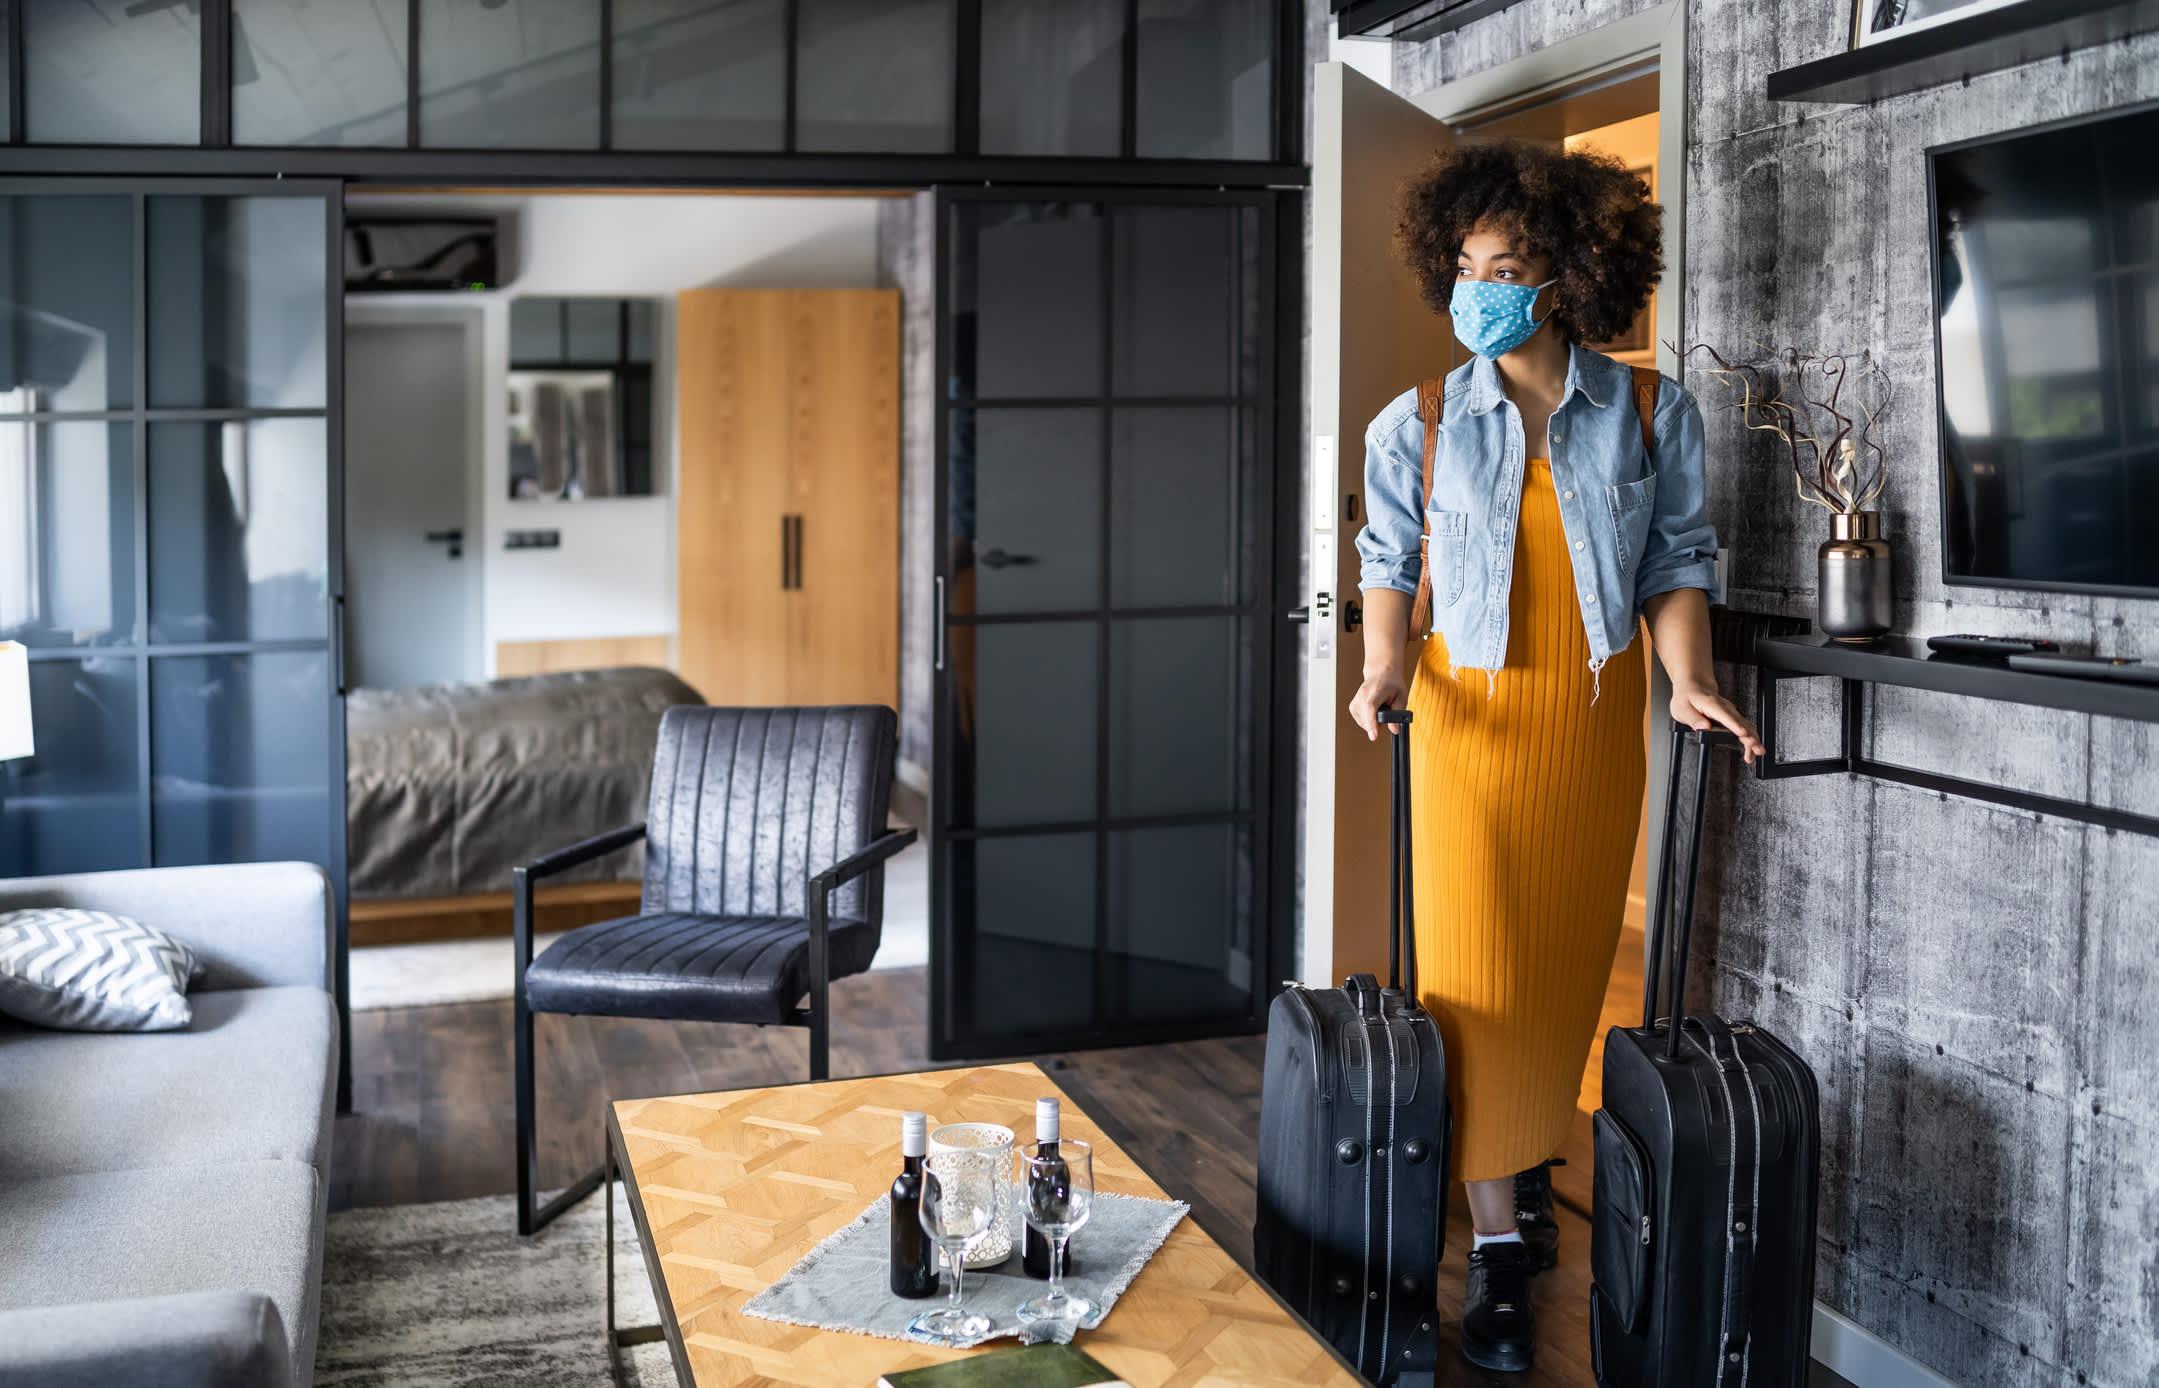 Lowongan dan vaksin: Bagaimana wisatawan mampu terbebas dari usaha industri resor thumbnail